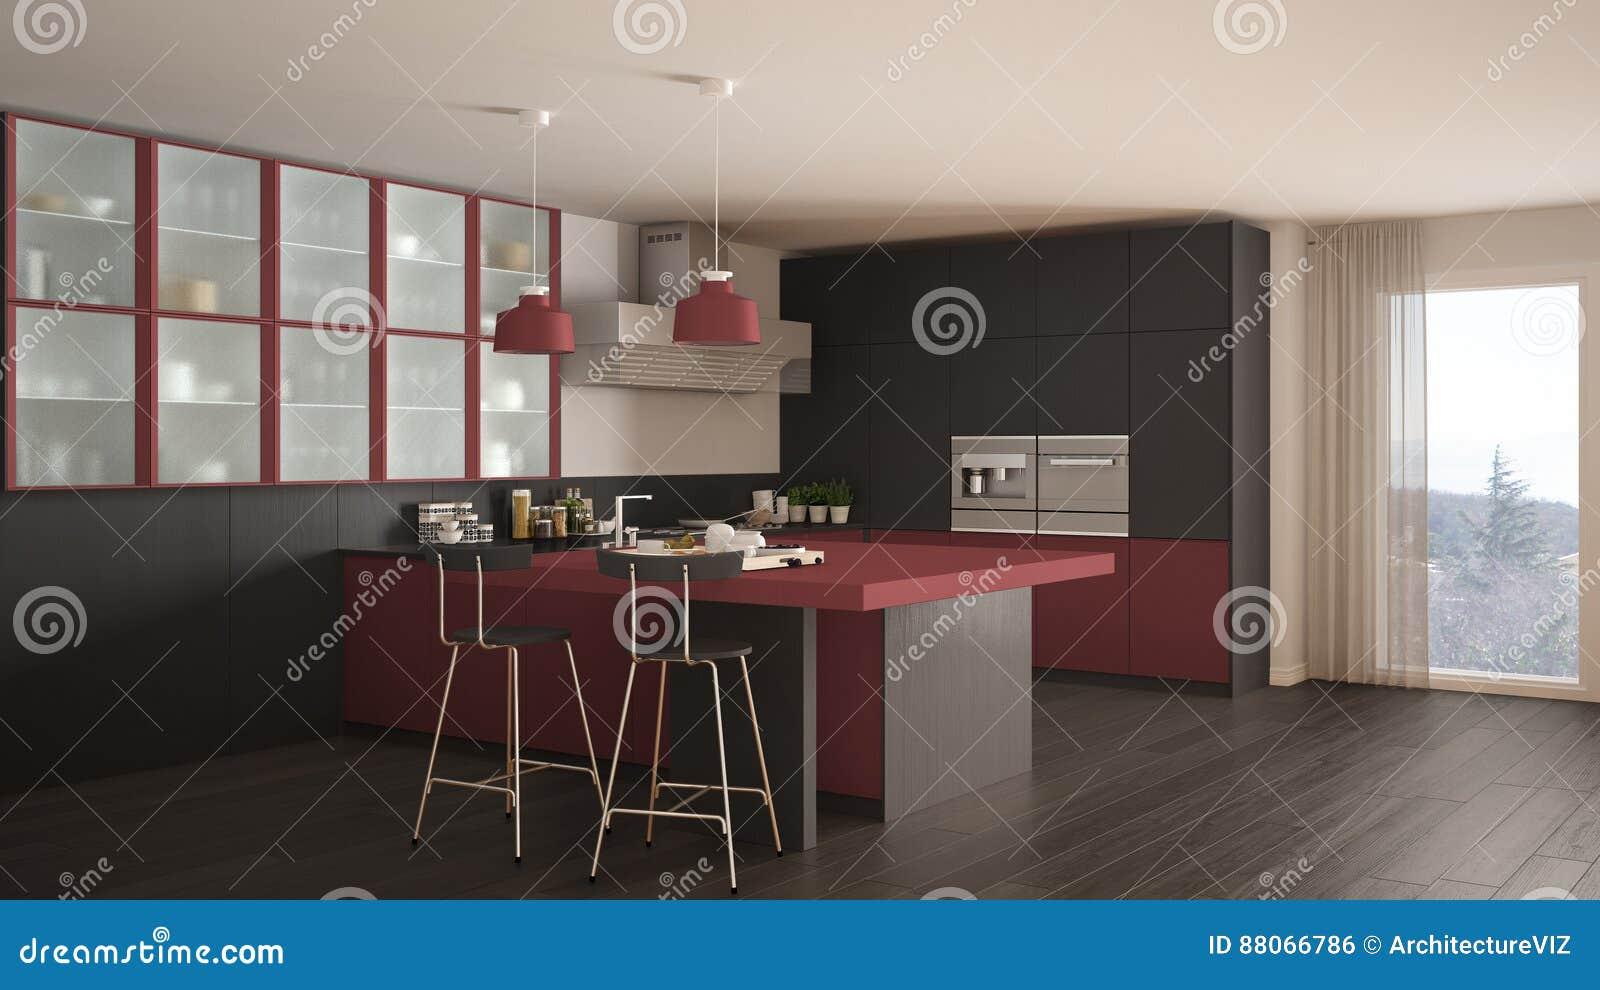 Grijze Keuken Modern : Klassieke minimale grijze en rode keuken met moderne parketvloer